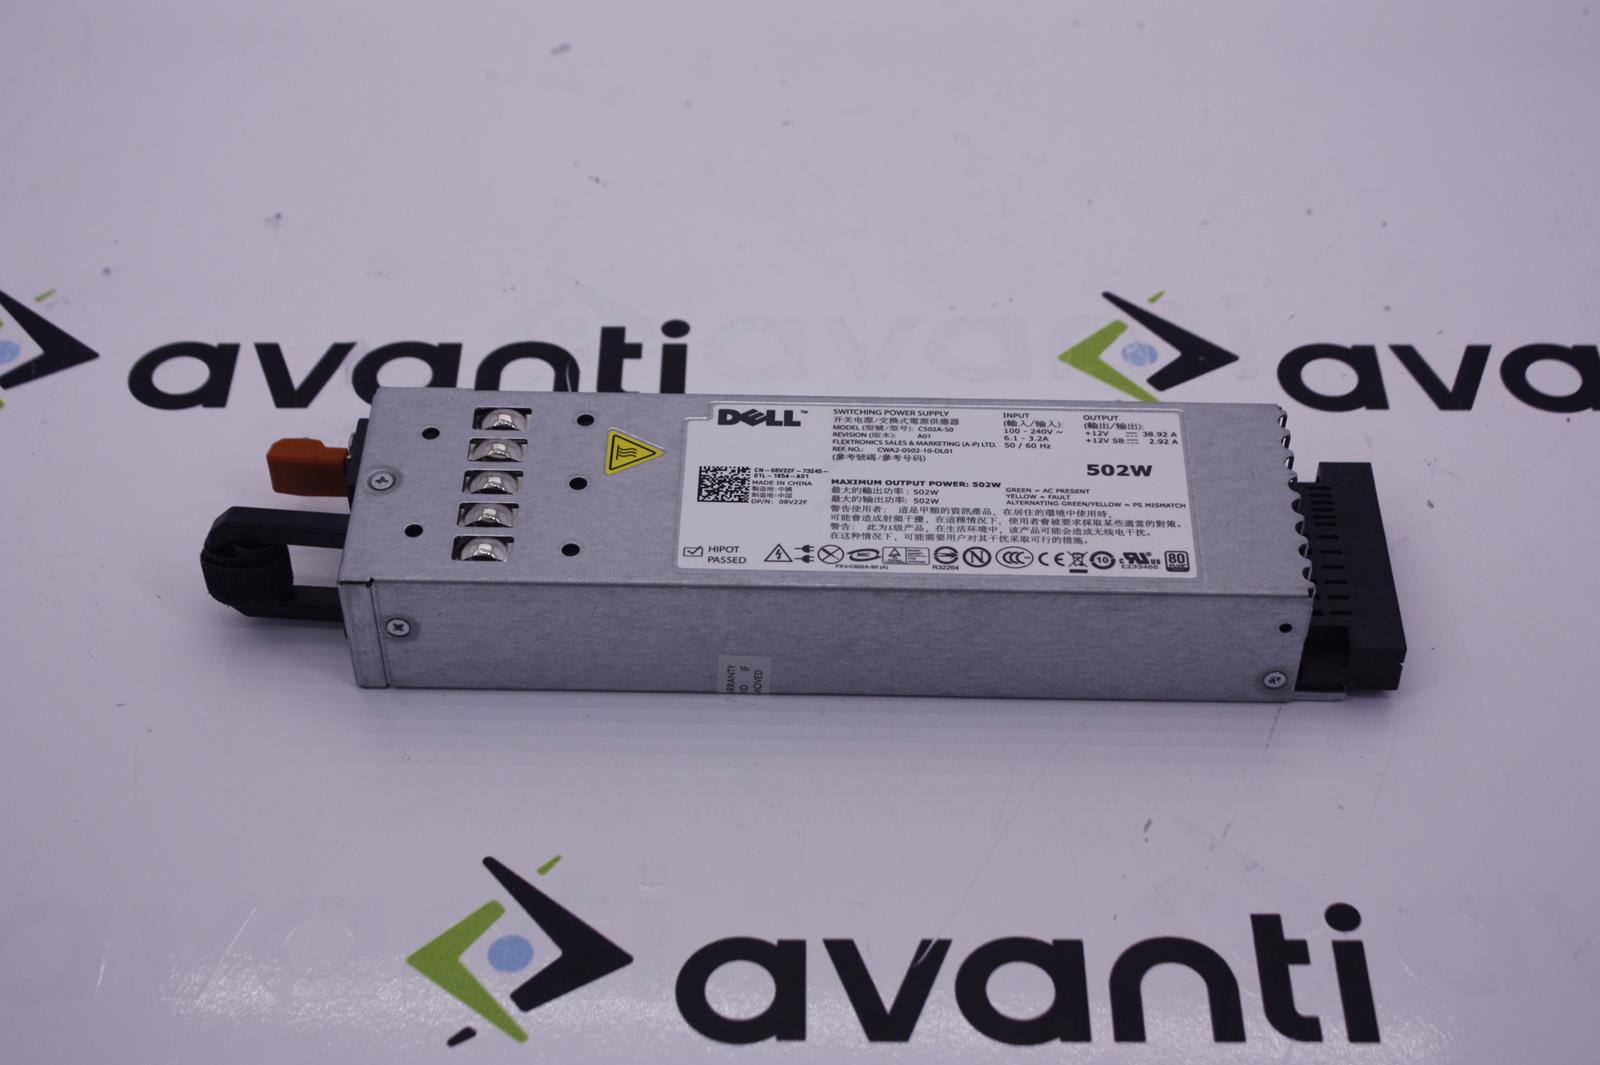 DXWMN Dell 502 Watt Power Supply New Pull. Certified Refurbished